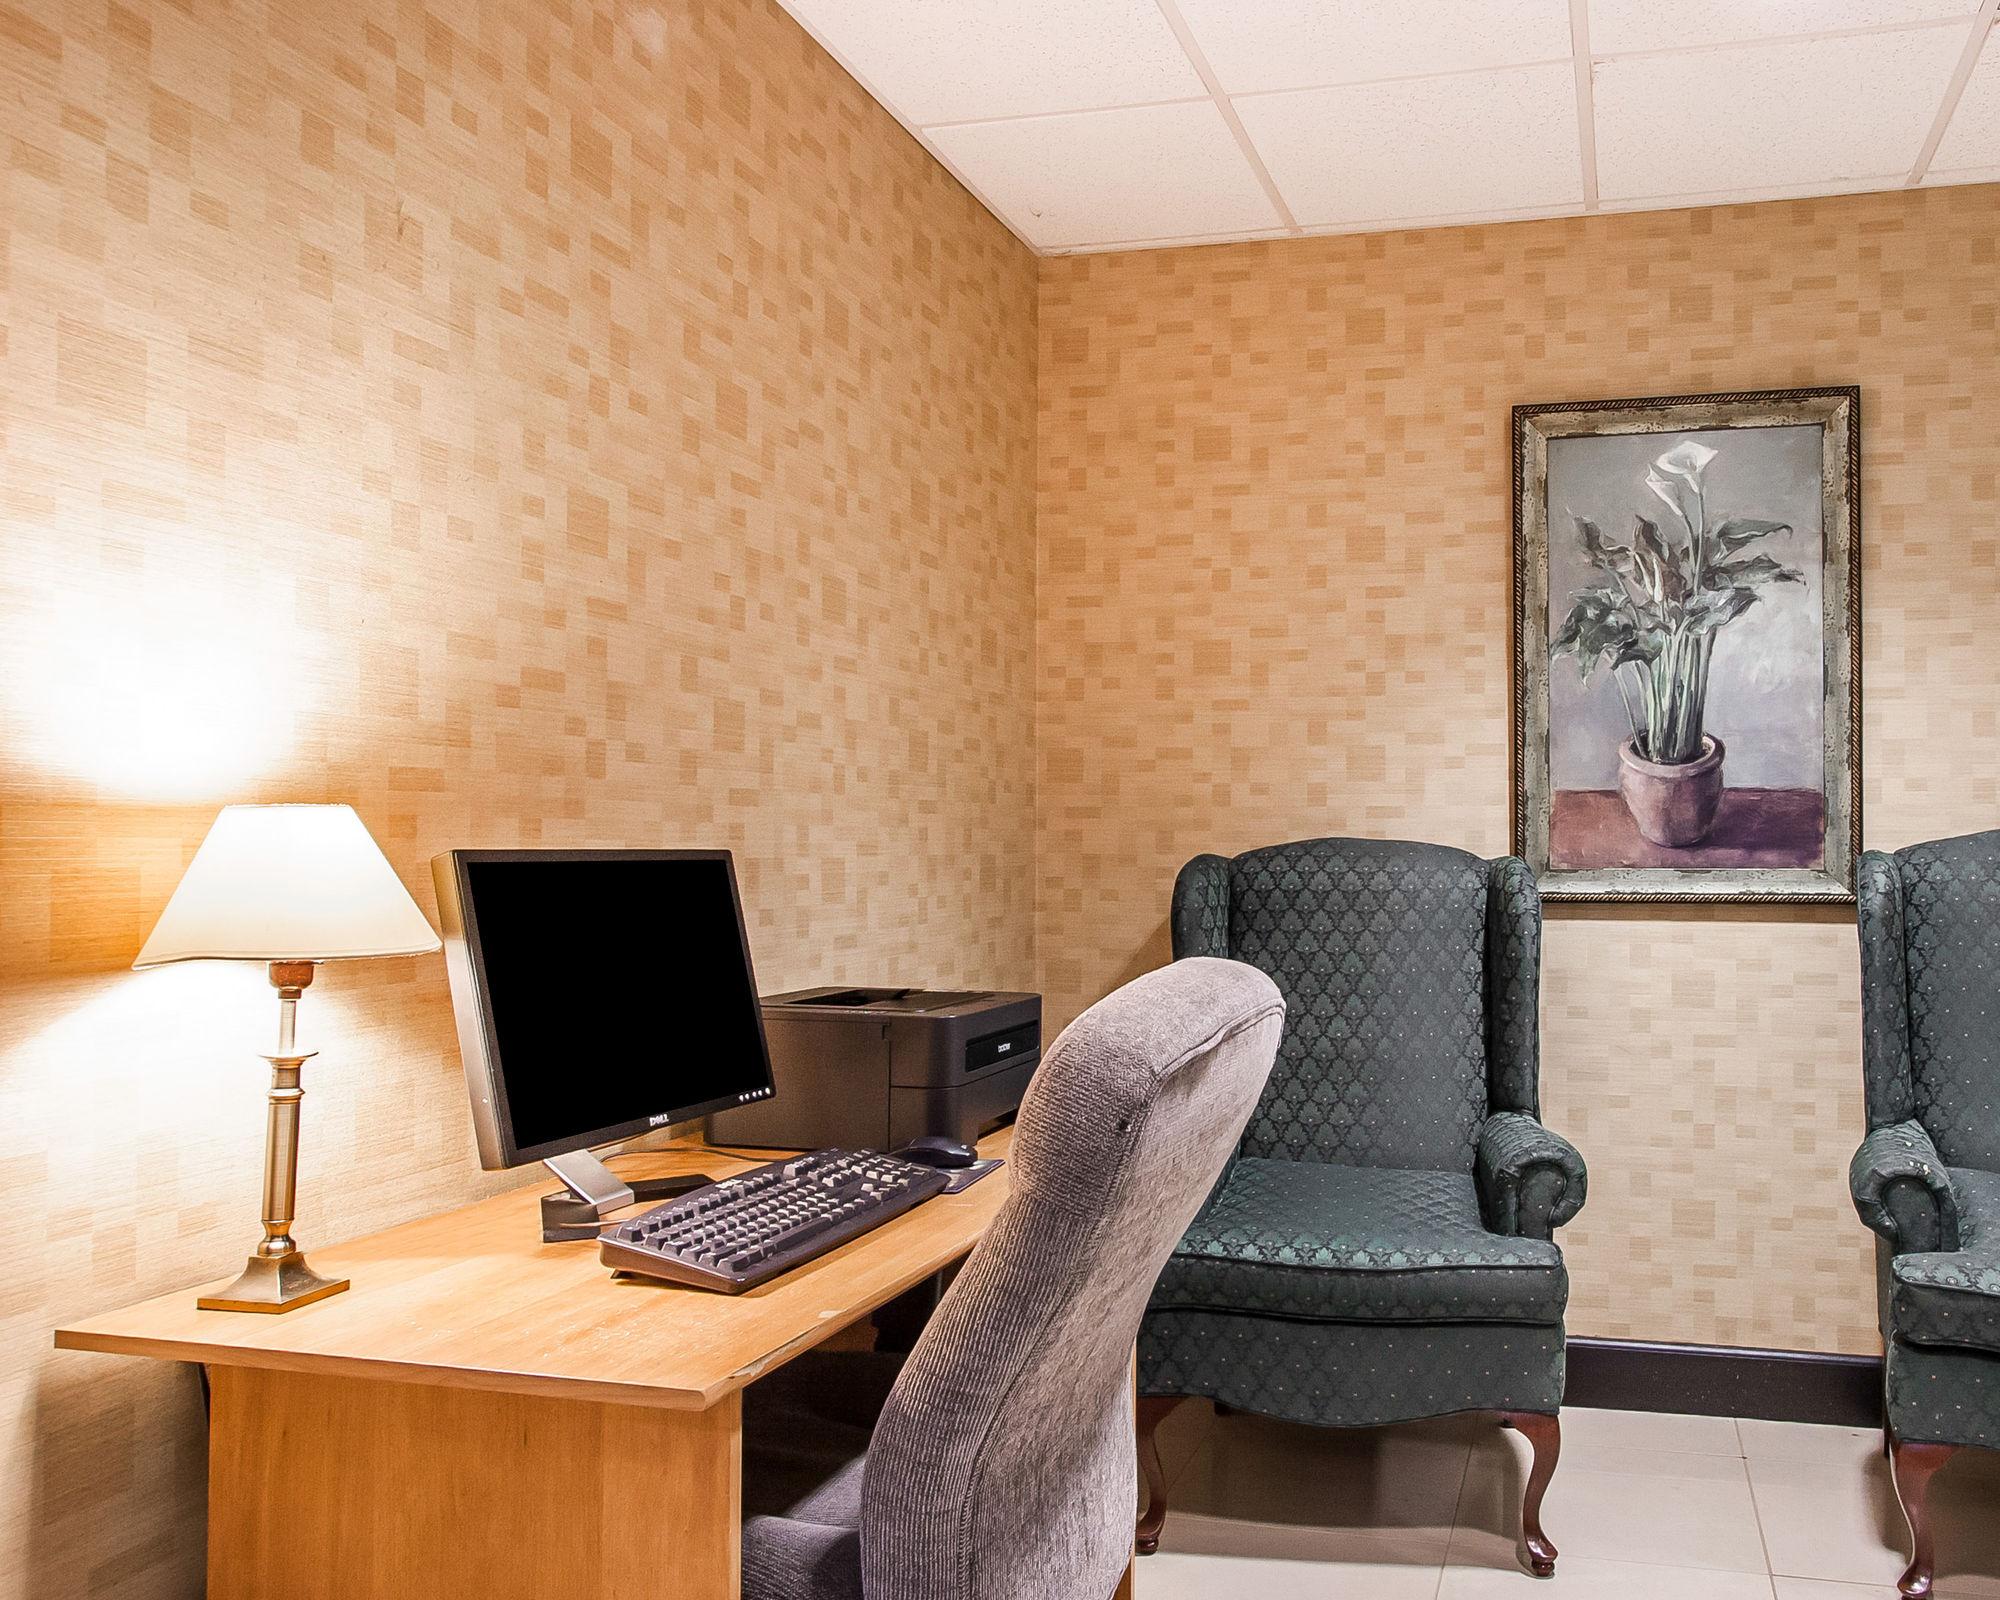 Comfort Inn And Suites in Montgomery, AL